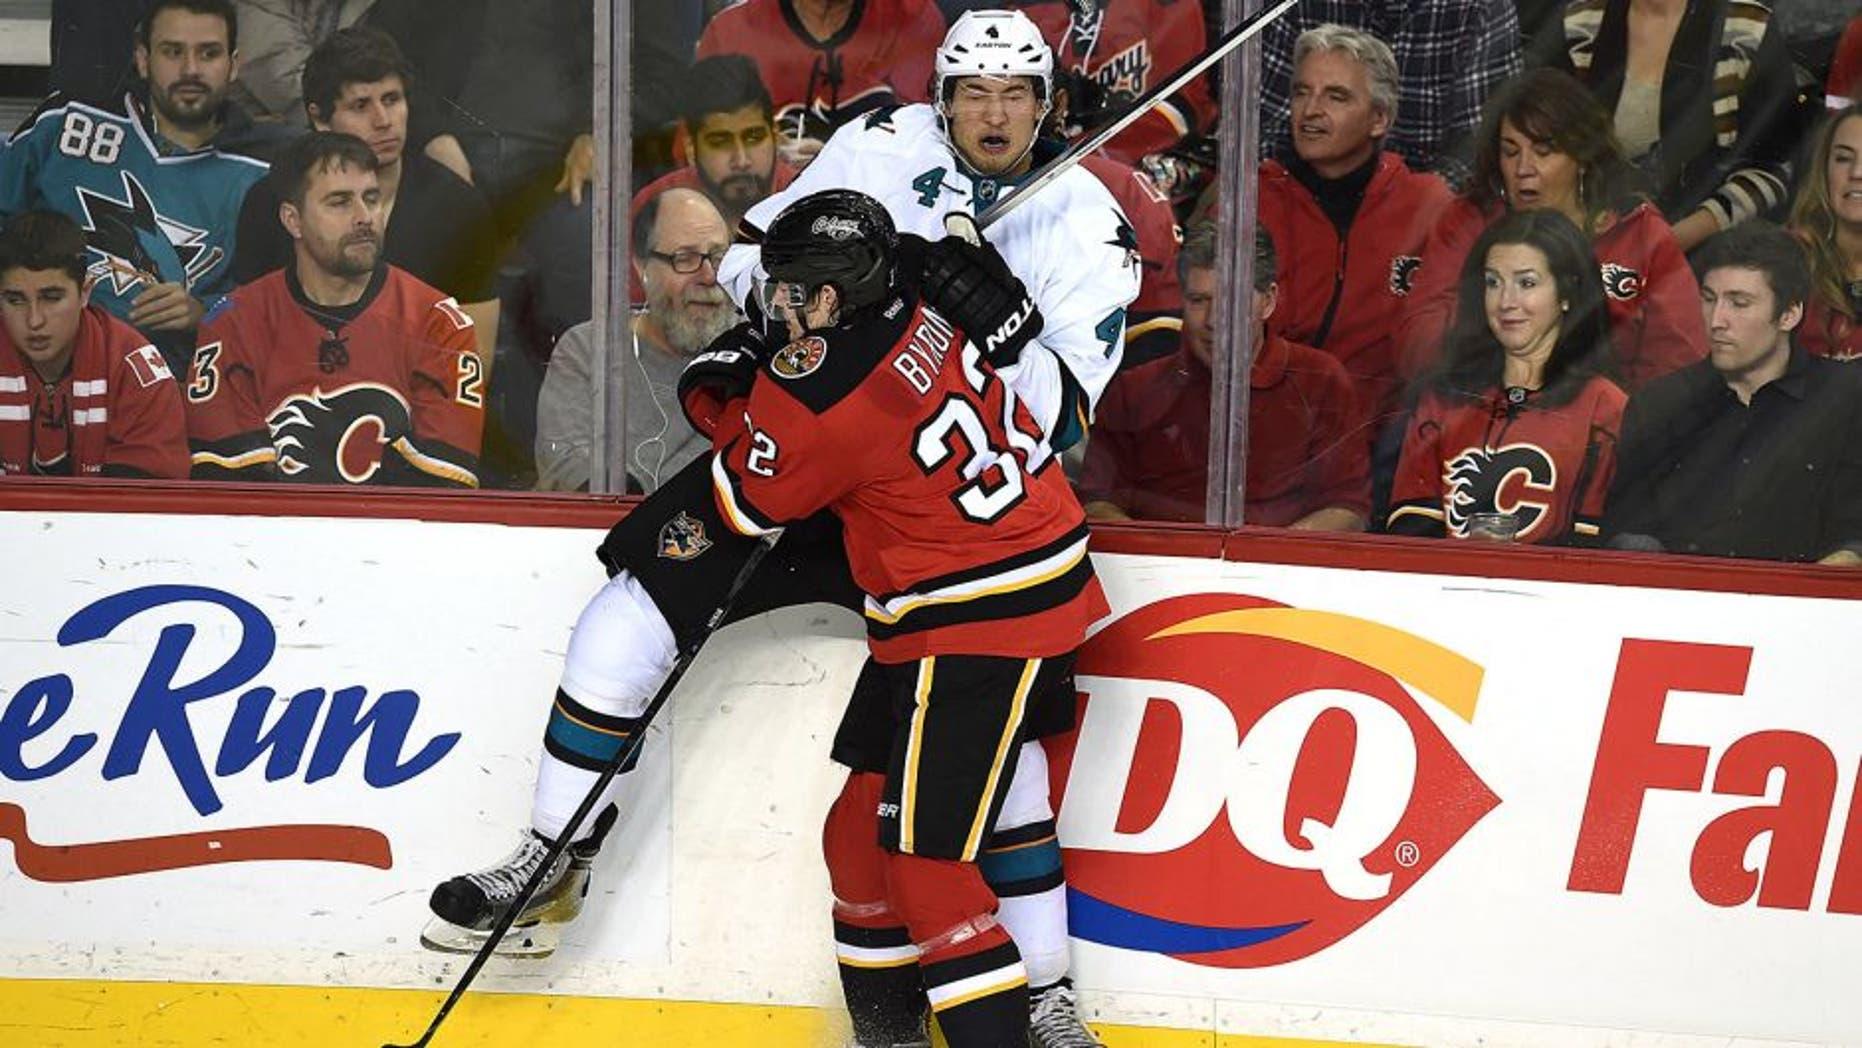 Dec 6, 2014; Calgary, Alberta, CAN; Calgary Flames center Paul Byron (32) checks San Jose Sharks defenseman Brenden Dillon (4) at Scotiabank Saddledome. Sharks won 3-2. Mandatory Credit: Candice Ward-USA TODAY Sports